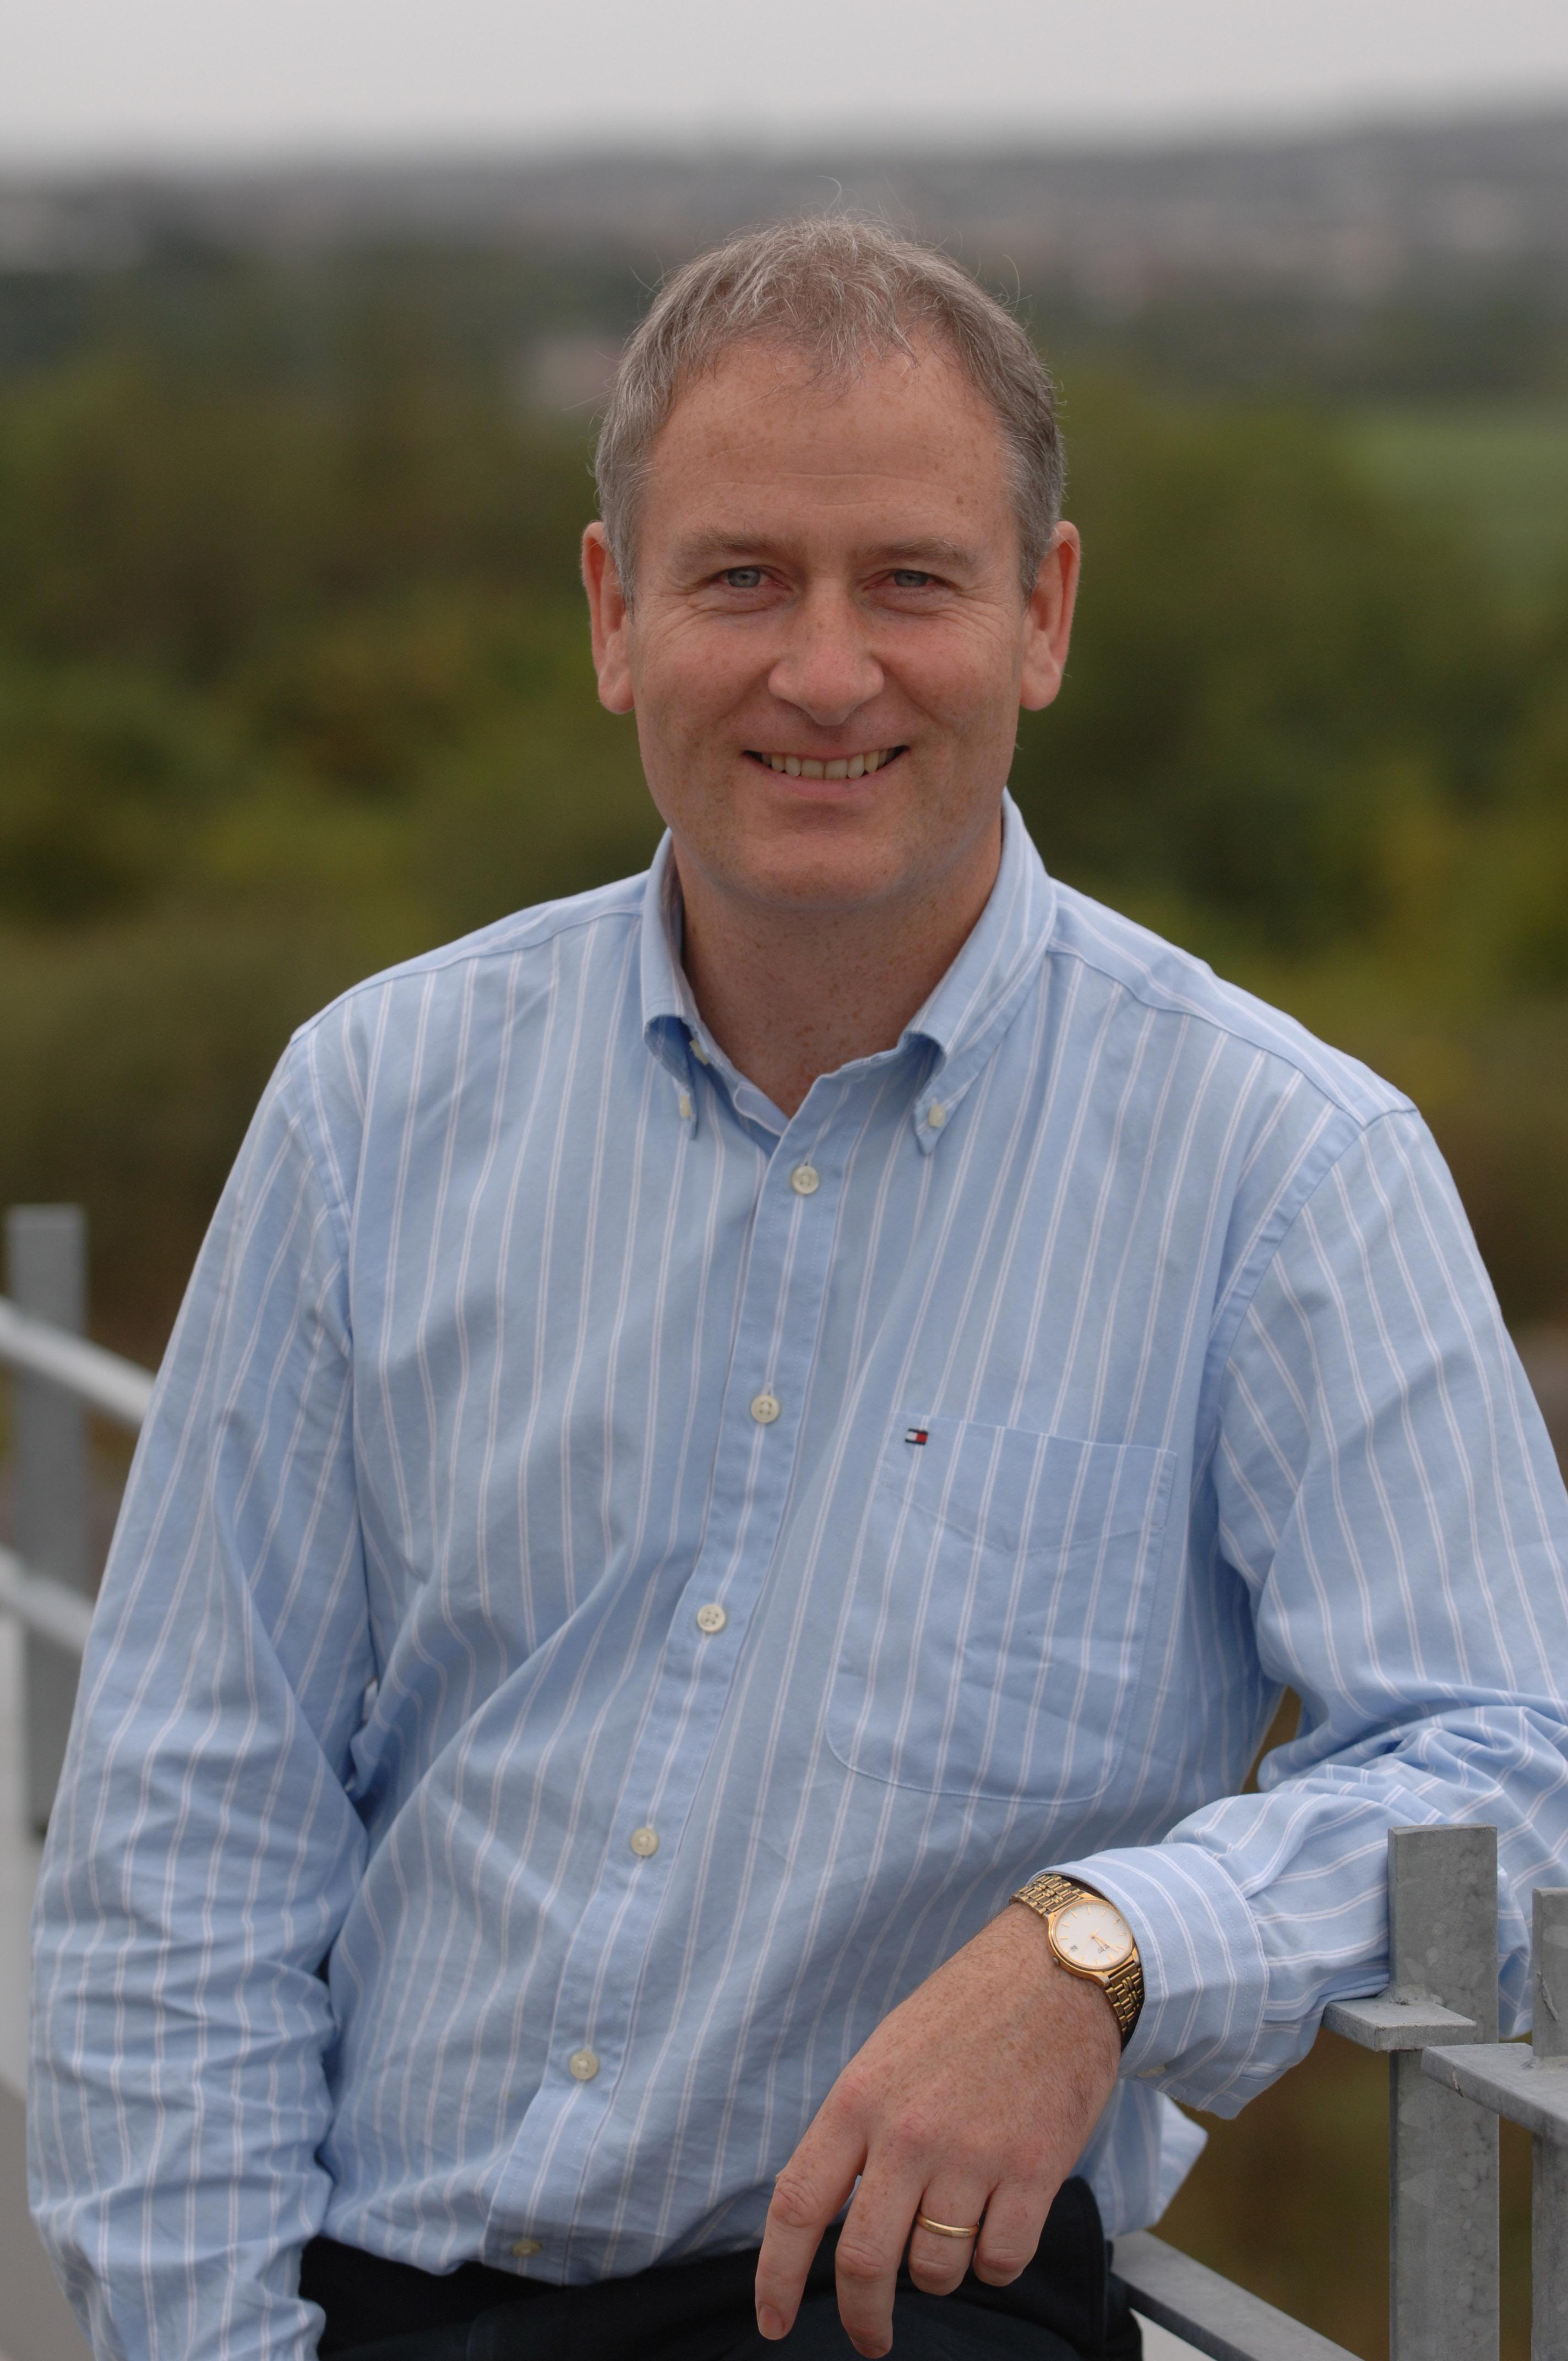 Sean Jackson, managing director, BSM Consulting